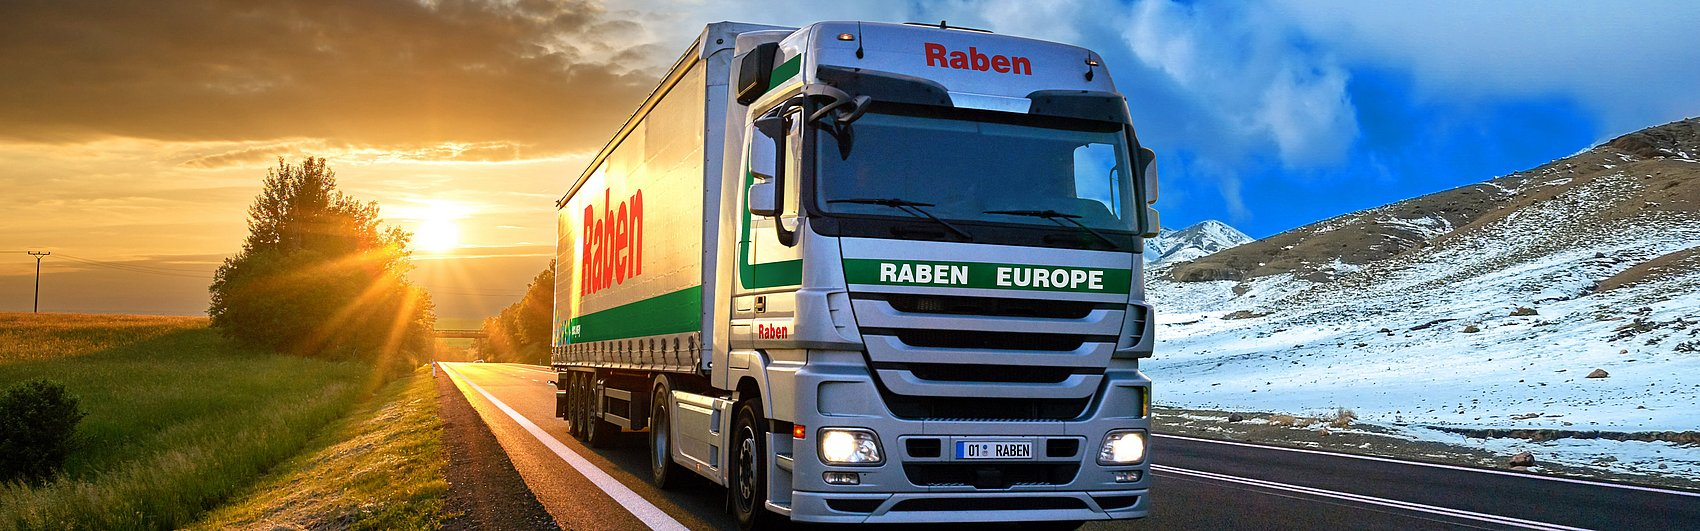 csm_KV_2019_Raben_Group_Europe_ca4e4cf77c.jpg